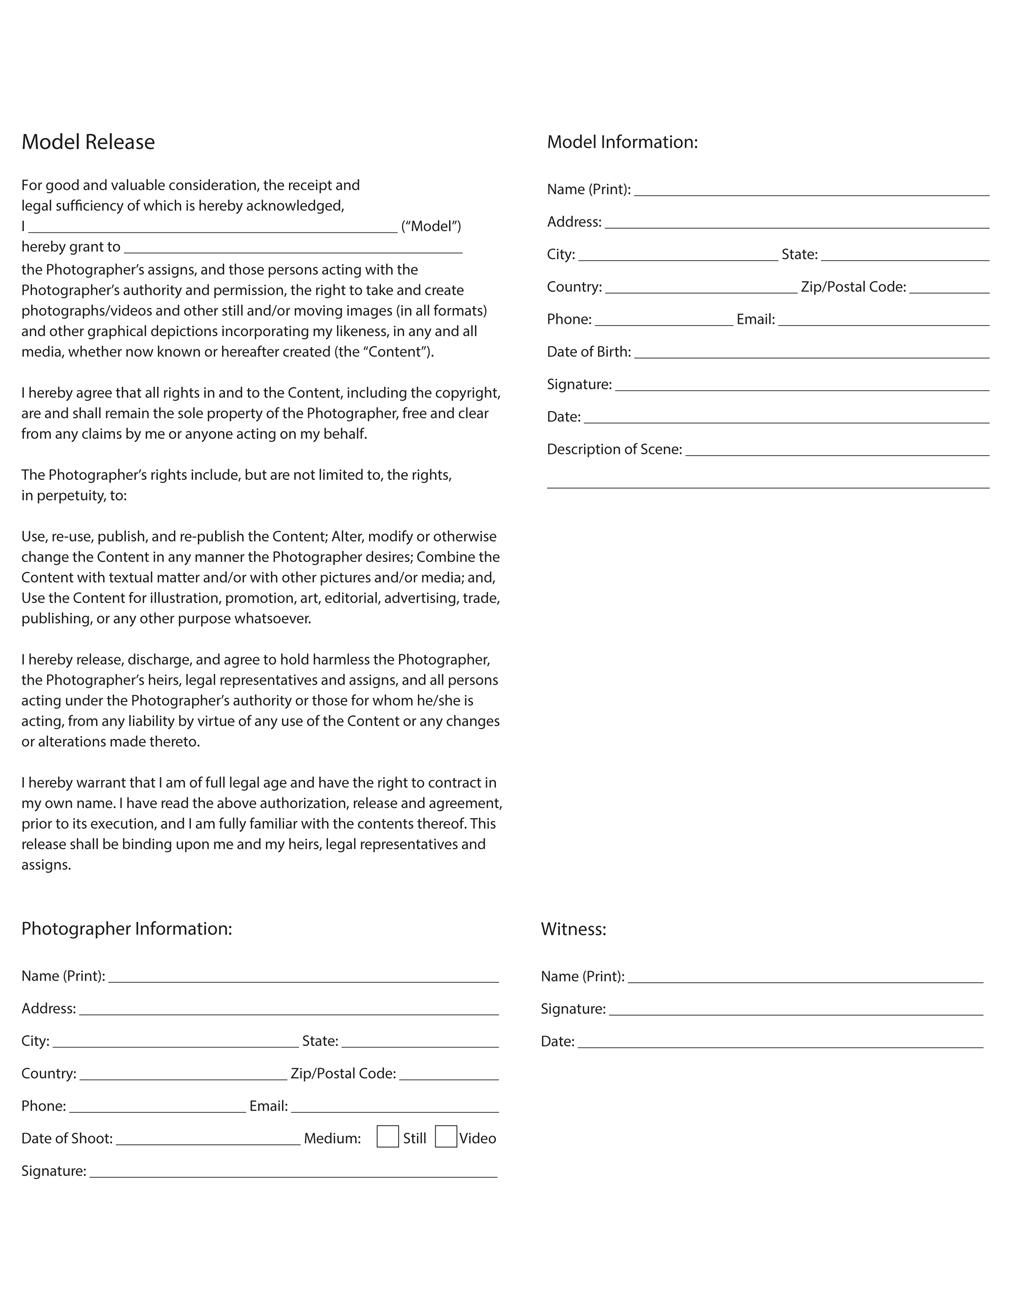 Makeup artist model release form template - Gary oldman next movie